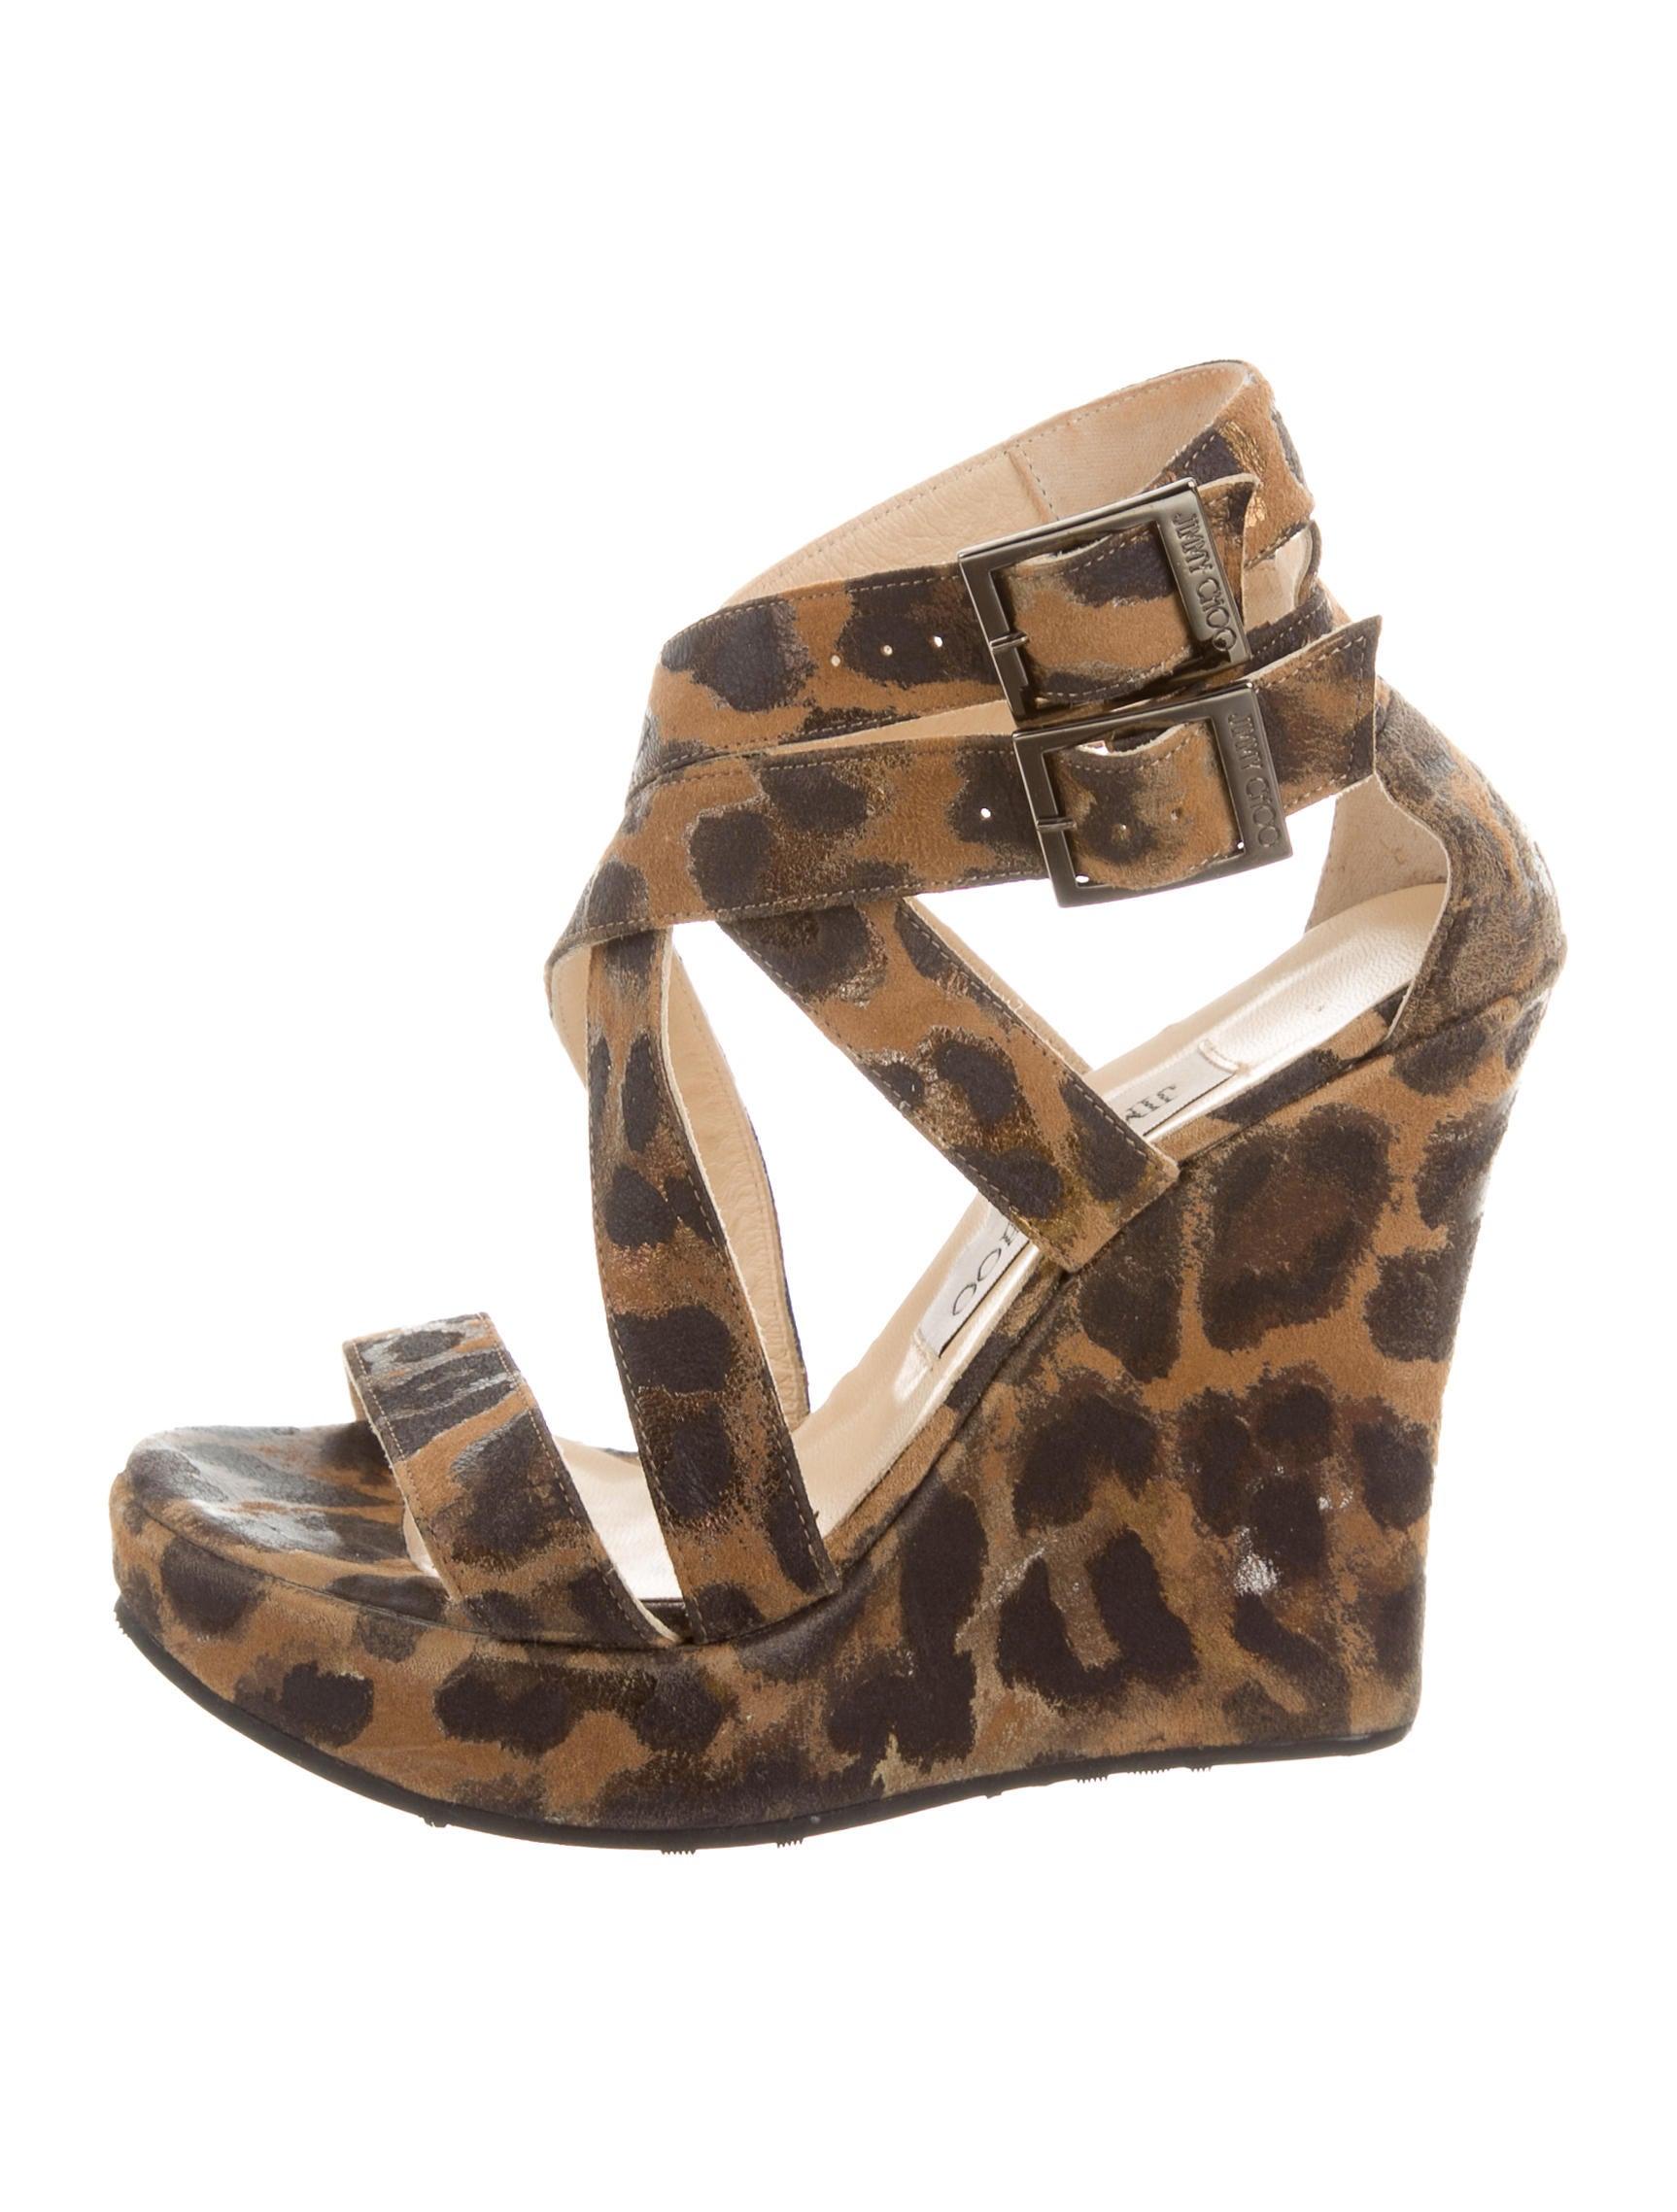 jimmy choo leopard wedge sandals shoes jim60355 the